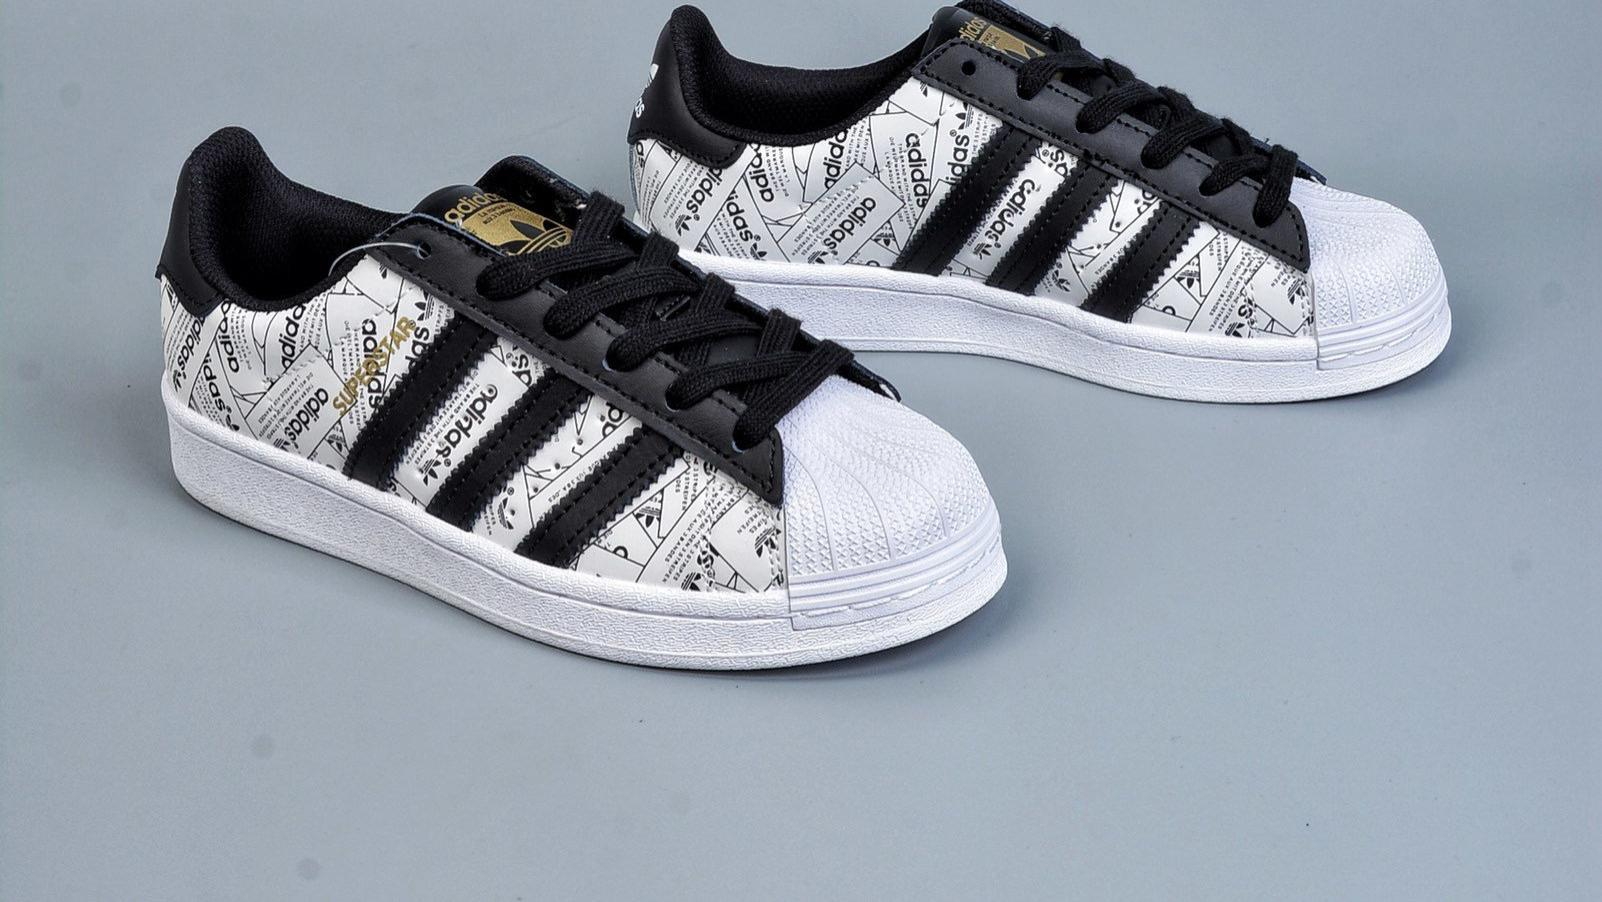 adidas originals Superstar 贝壳头50周年 白黑色炸街款 陈奕迅代言款